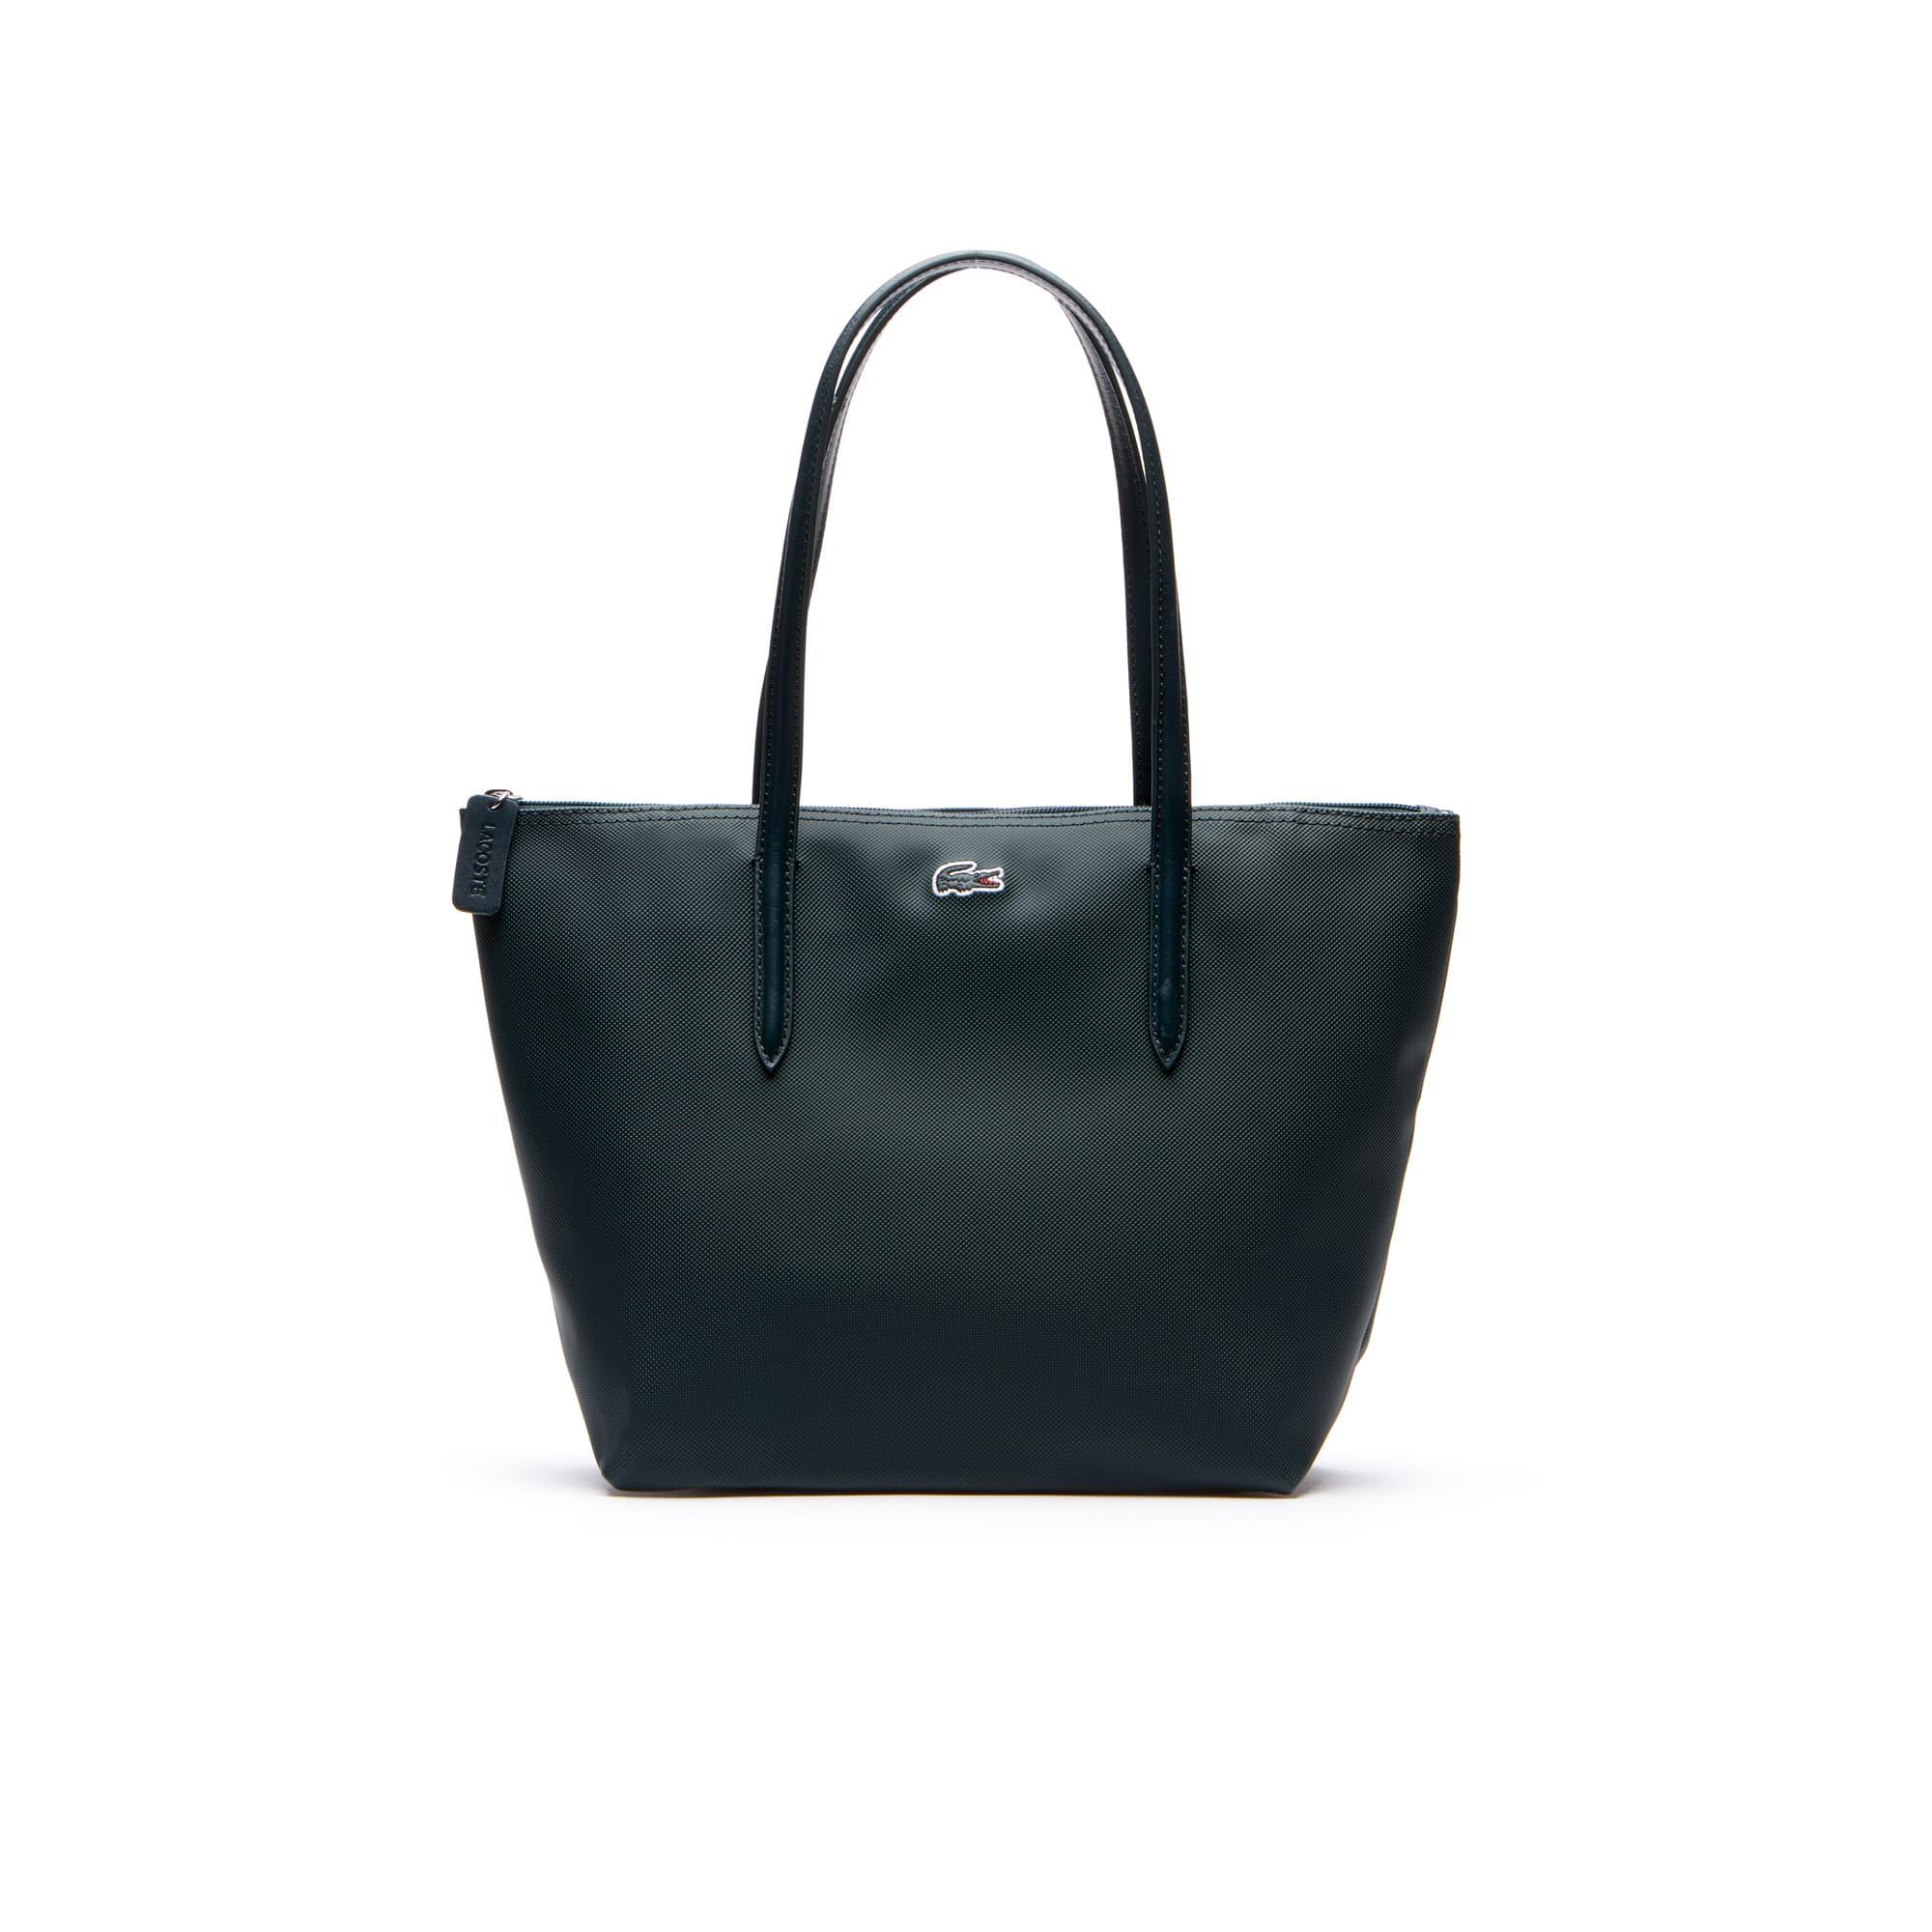 Shopping Bag Pequeño L.12.12 Concept